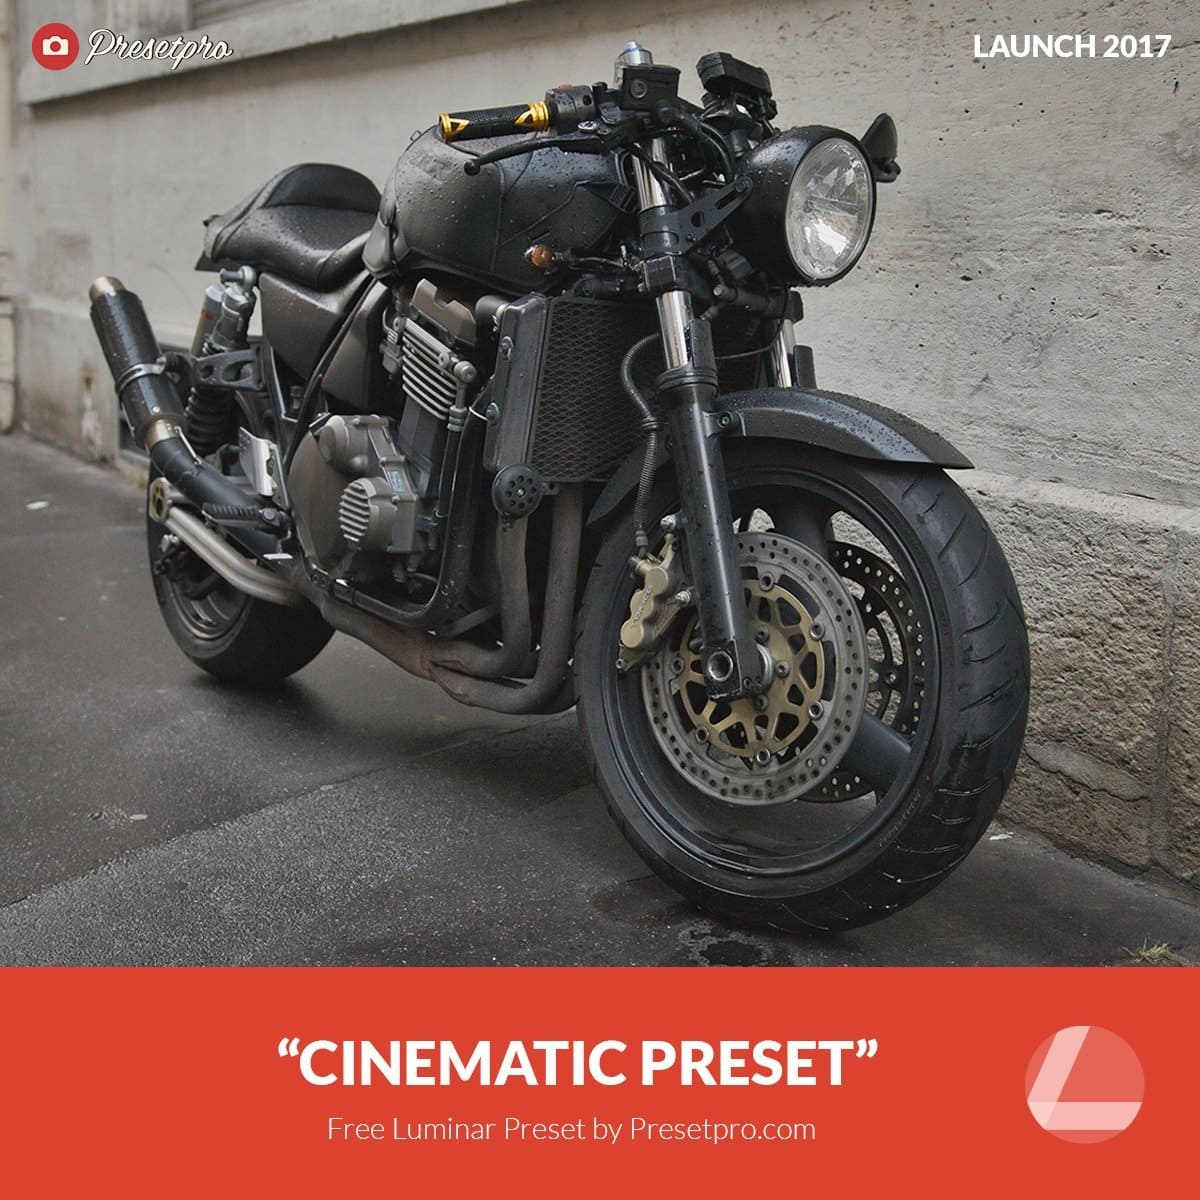 Free-Luminar-Preset-Cinematic